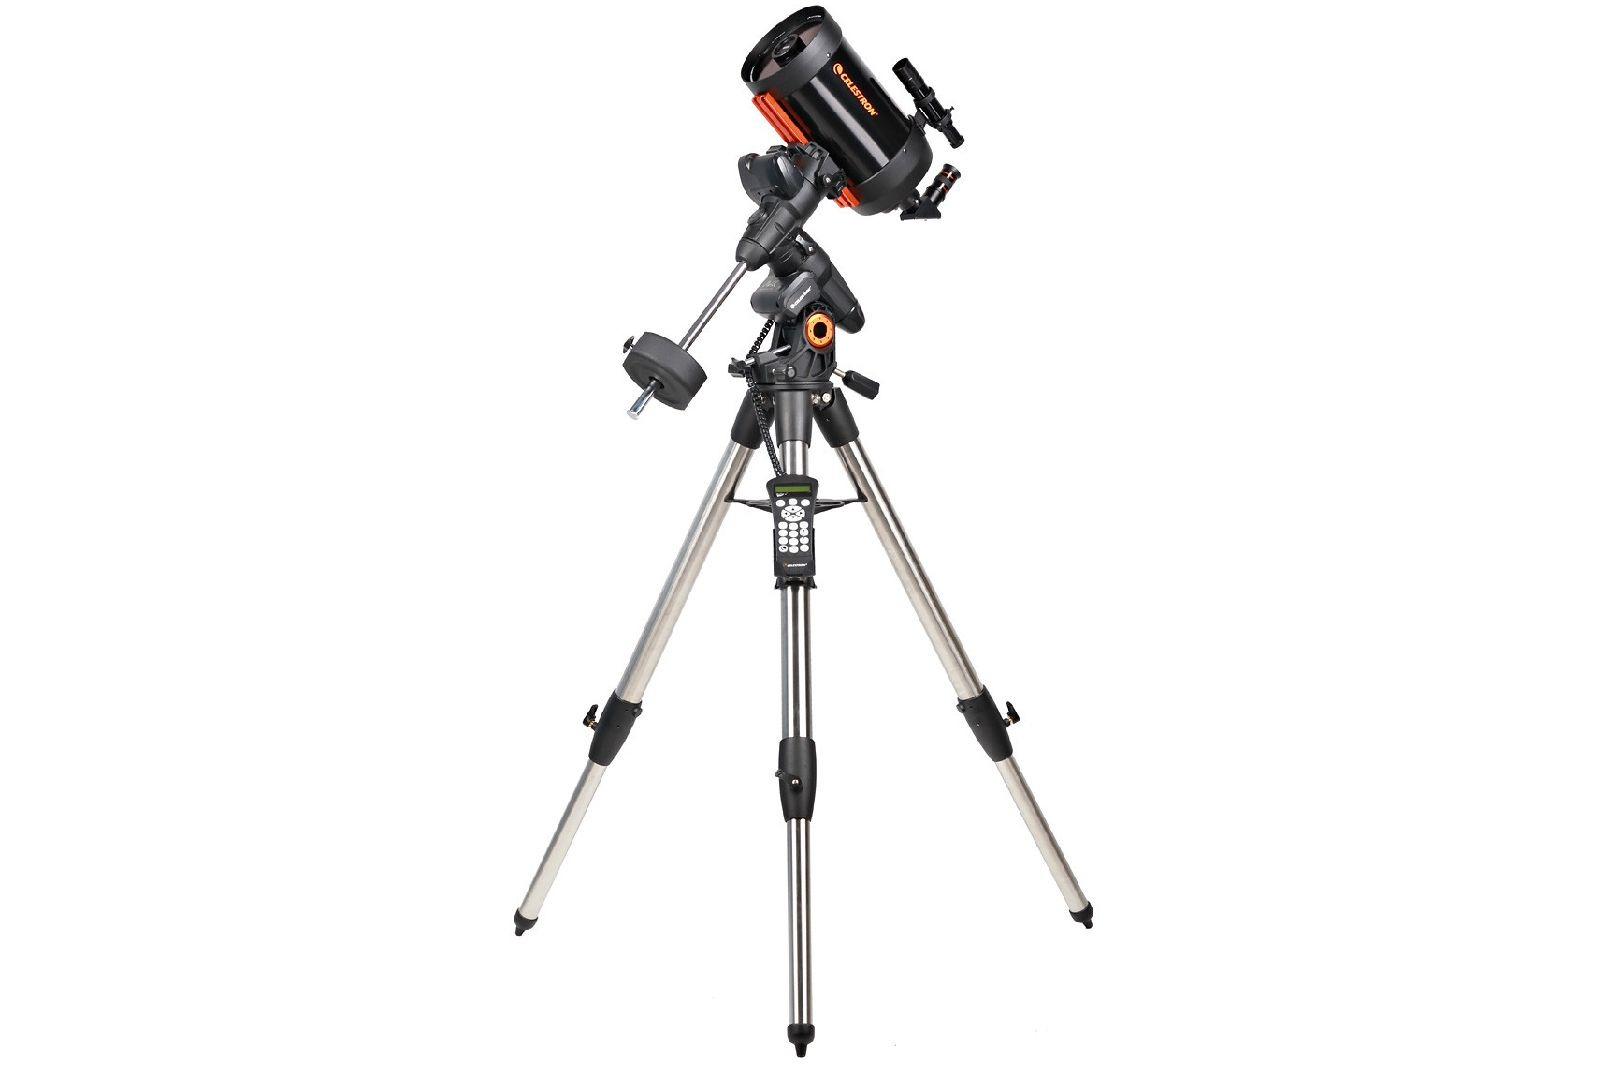 Image of Teleskop celestron advanced vx 6 sct (do.12079)